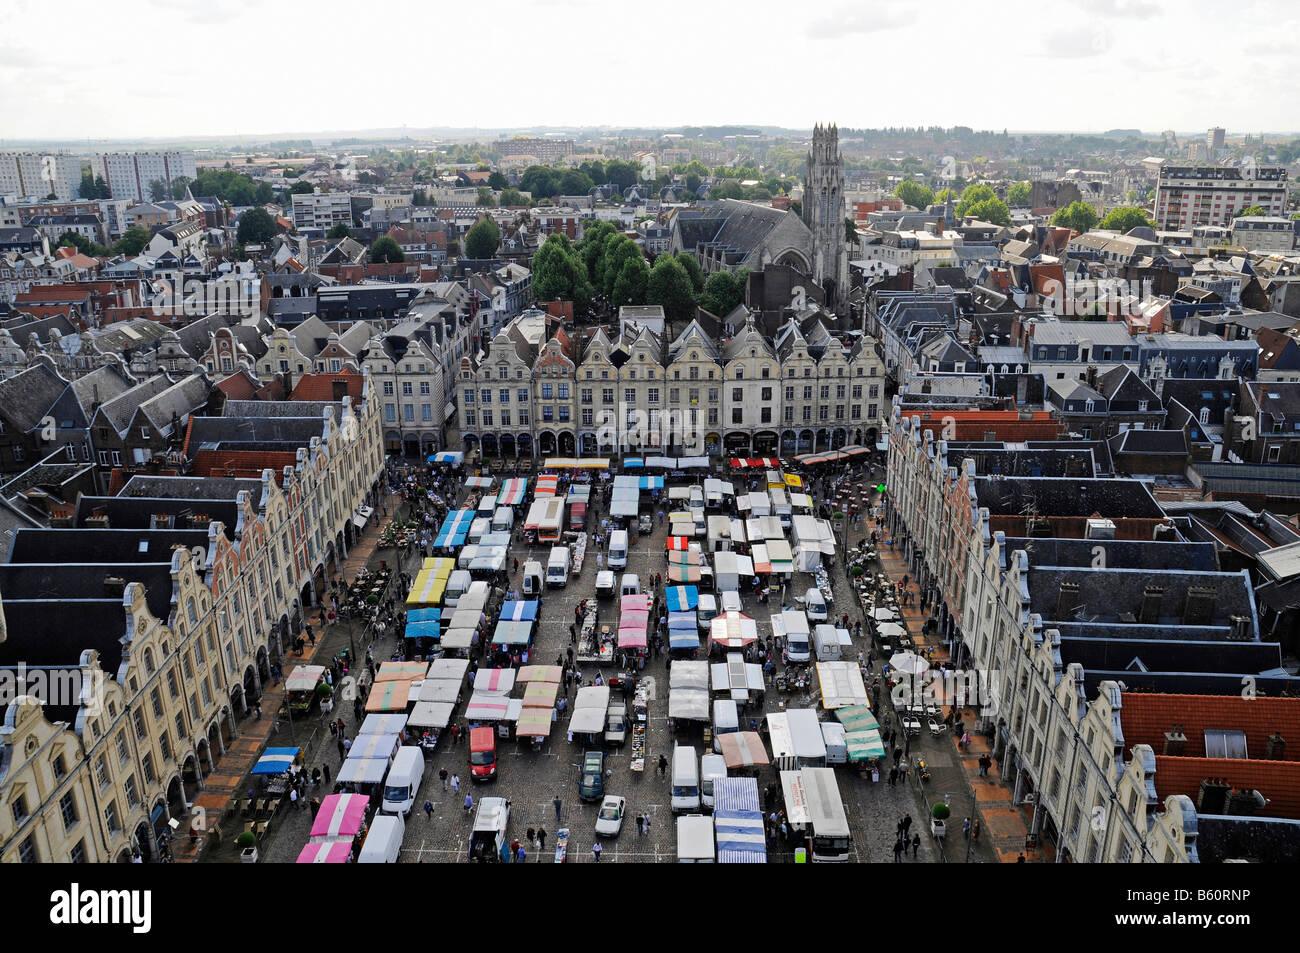 Weekly market, square, Place des Heros, city view, overview, Arras, Nord Pas de Calais, France, Europe Stock Photo